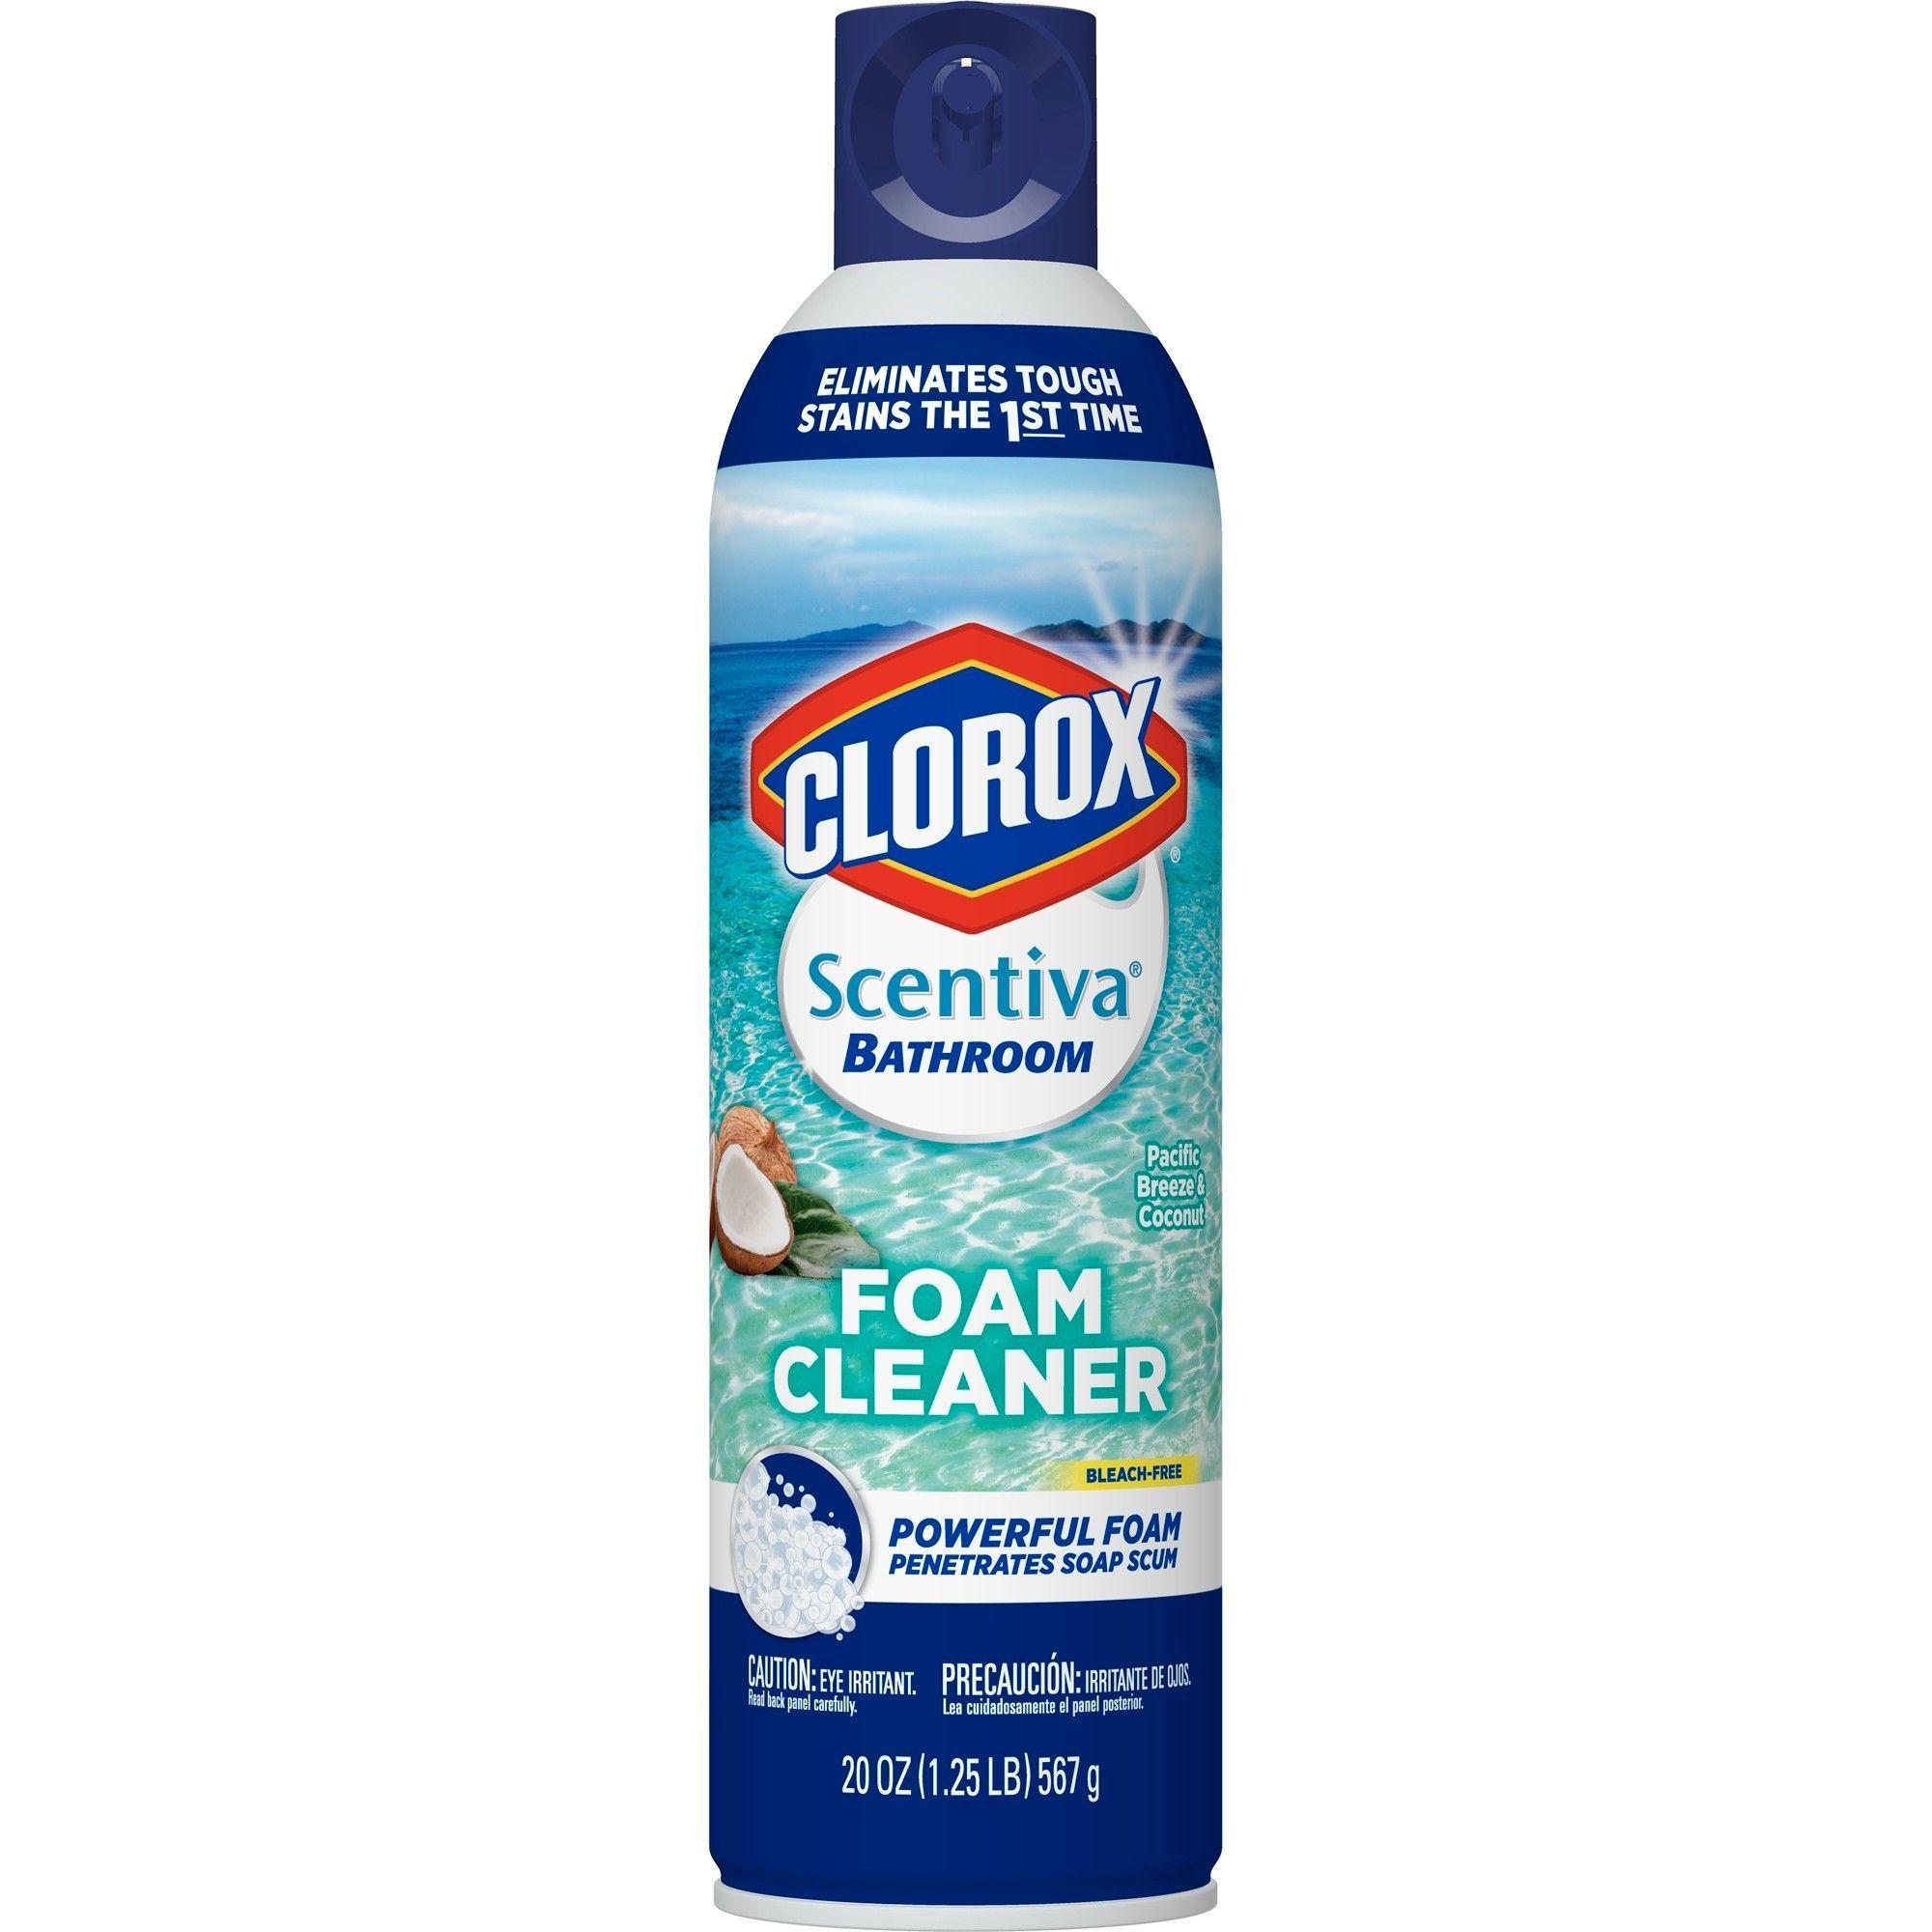 Clorox Scentiva Bathroom Foam Cleaner Bleach Free Surface Cleaner Pacific Breeze Coconut 20oz Surface Cleaner Clorox Sugar Scrub Diy